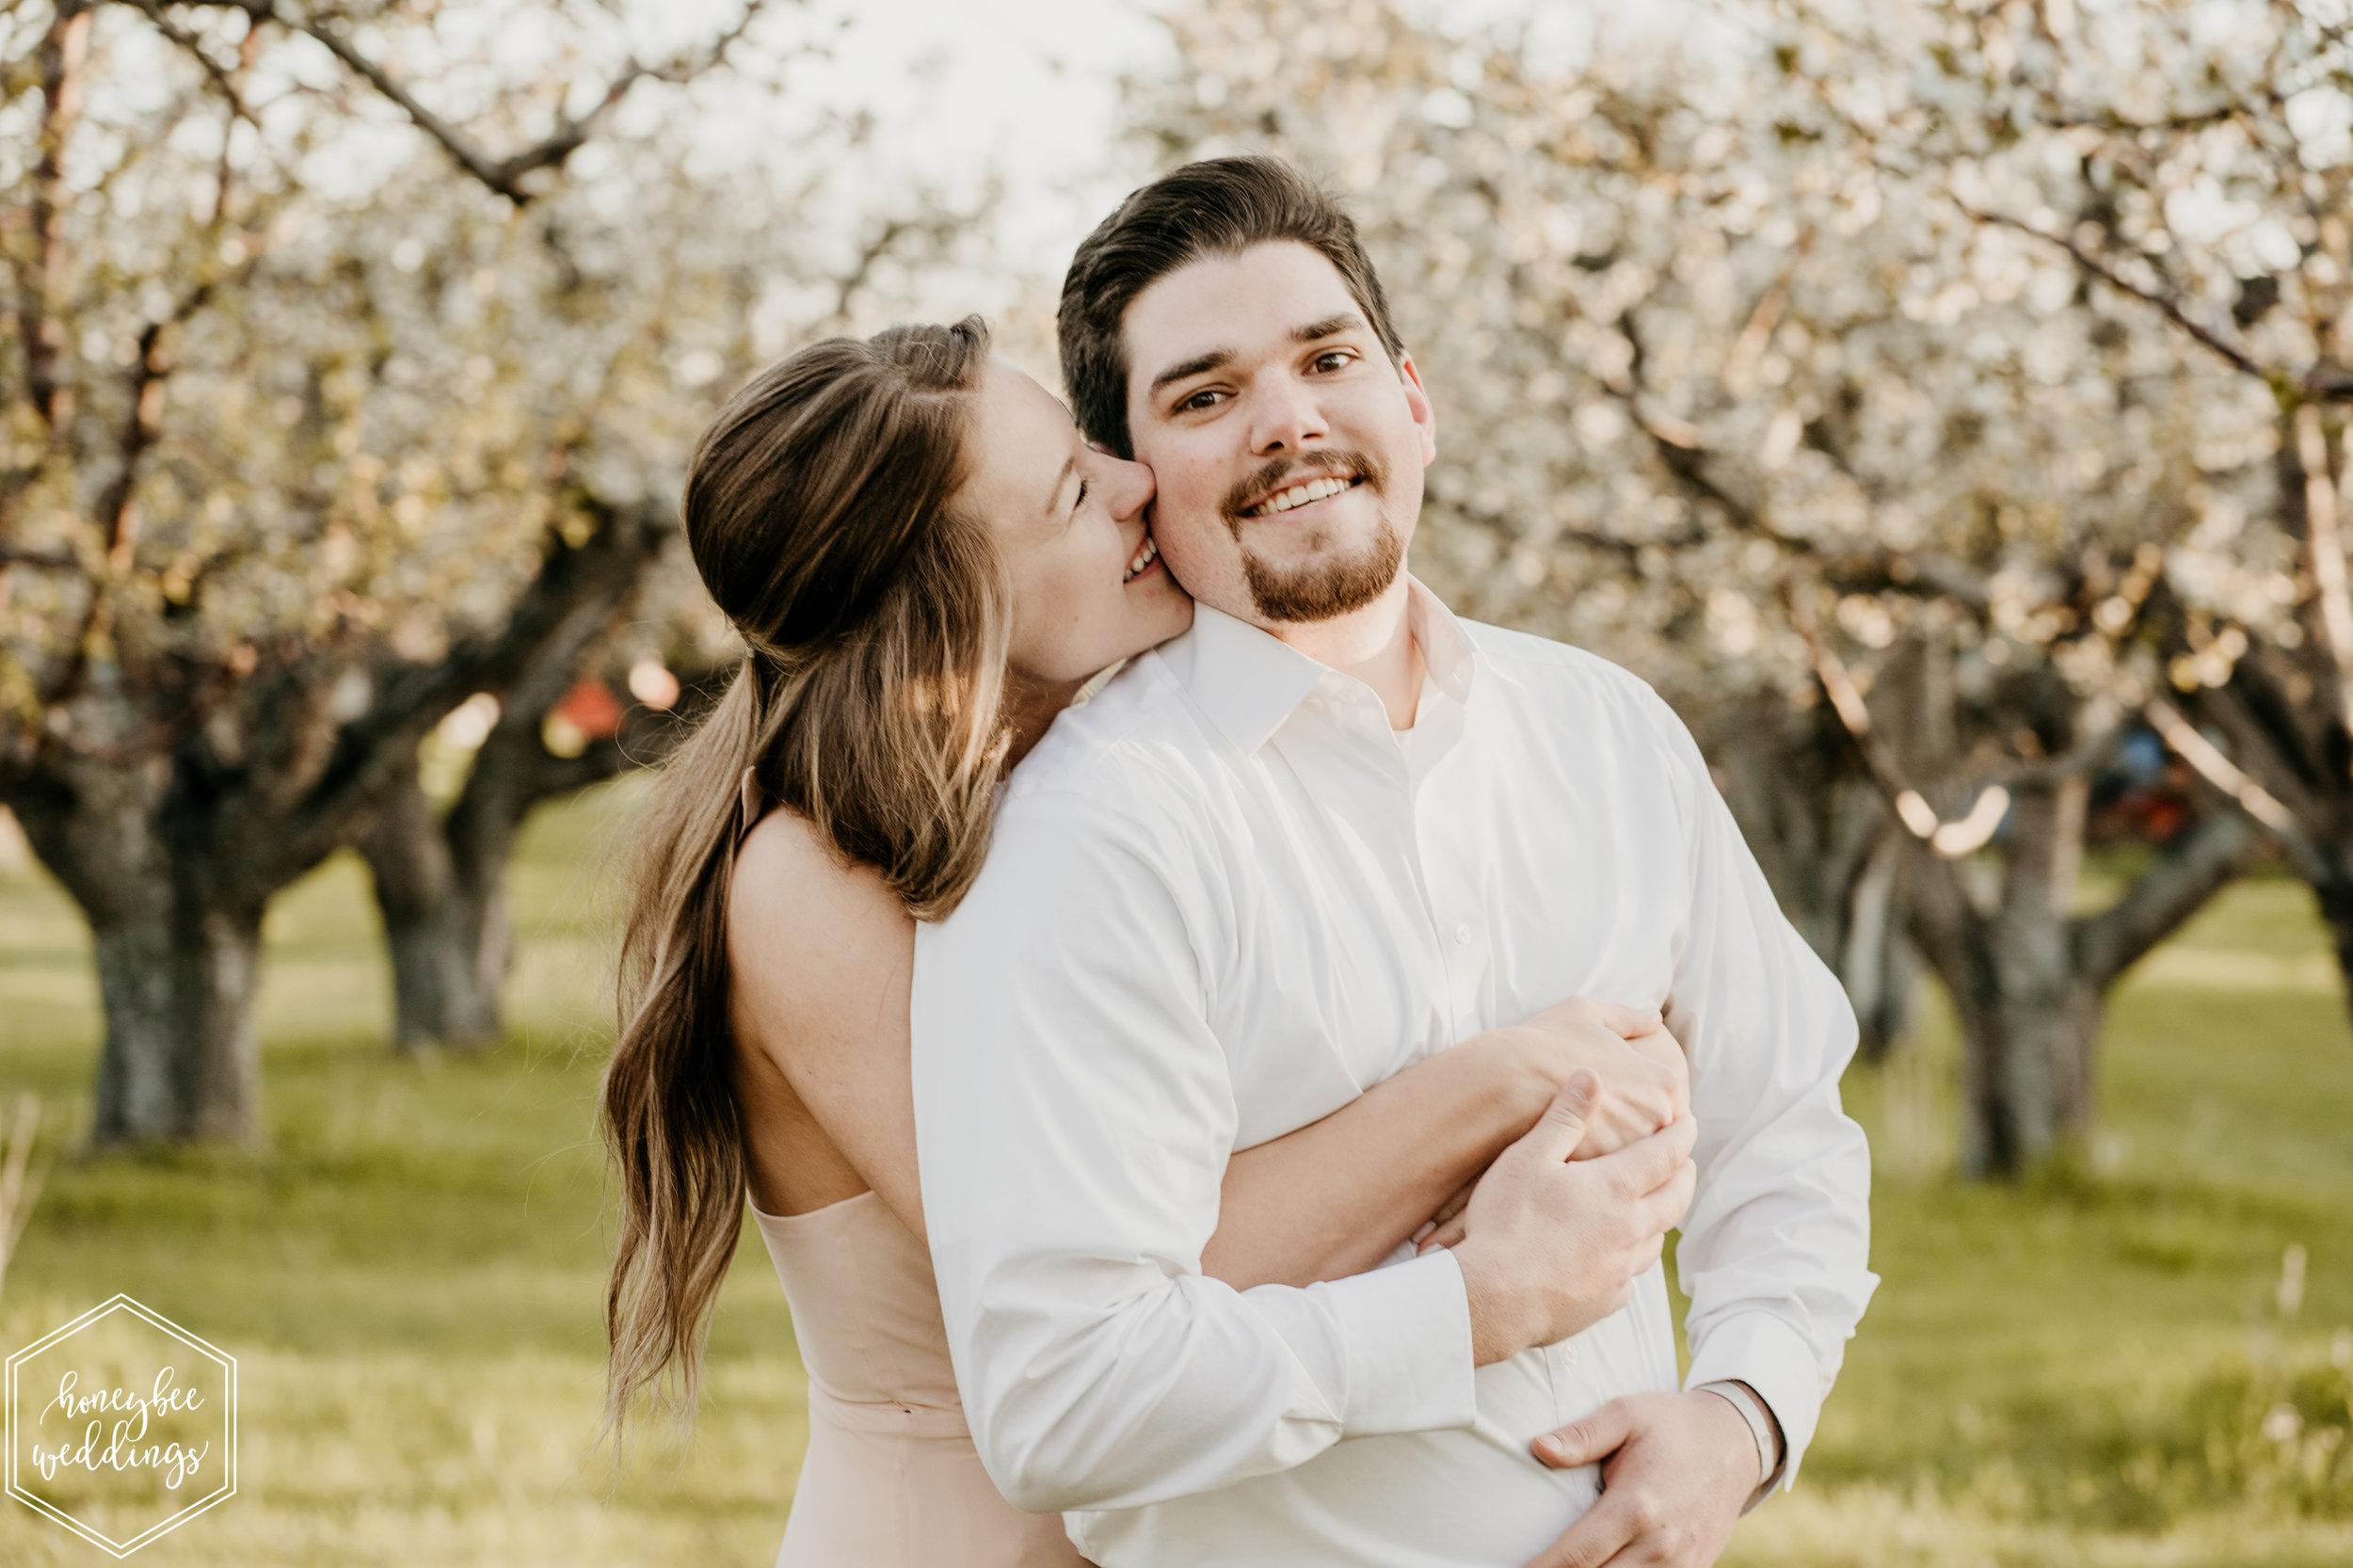 074Montana Wedding Photographer_Cherry Blossom Engagement Session_Ashlin & Luke_Honeybee Weddings_May 11, 2019-238.jpg